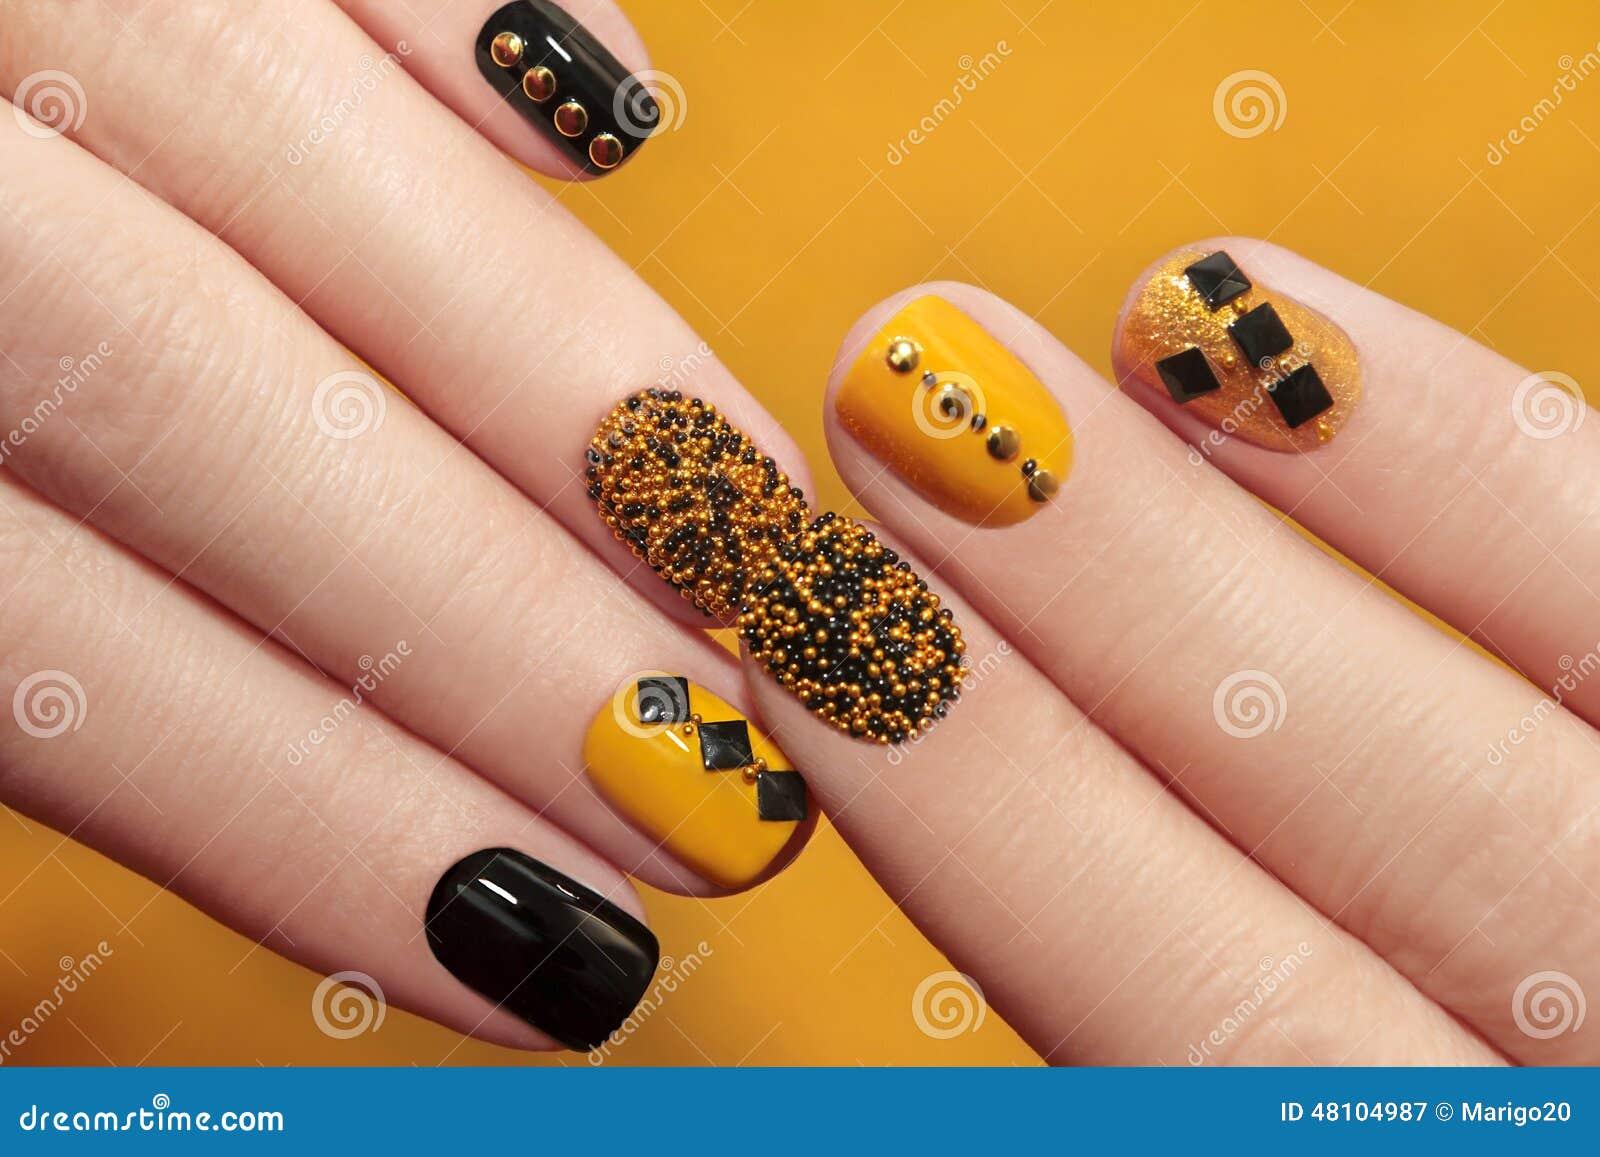 Caviar Manicure Stock Image Image Of Gold Design Nail 48104987